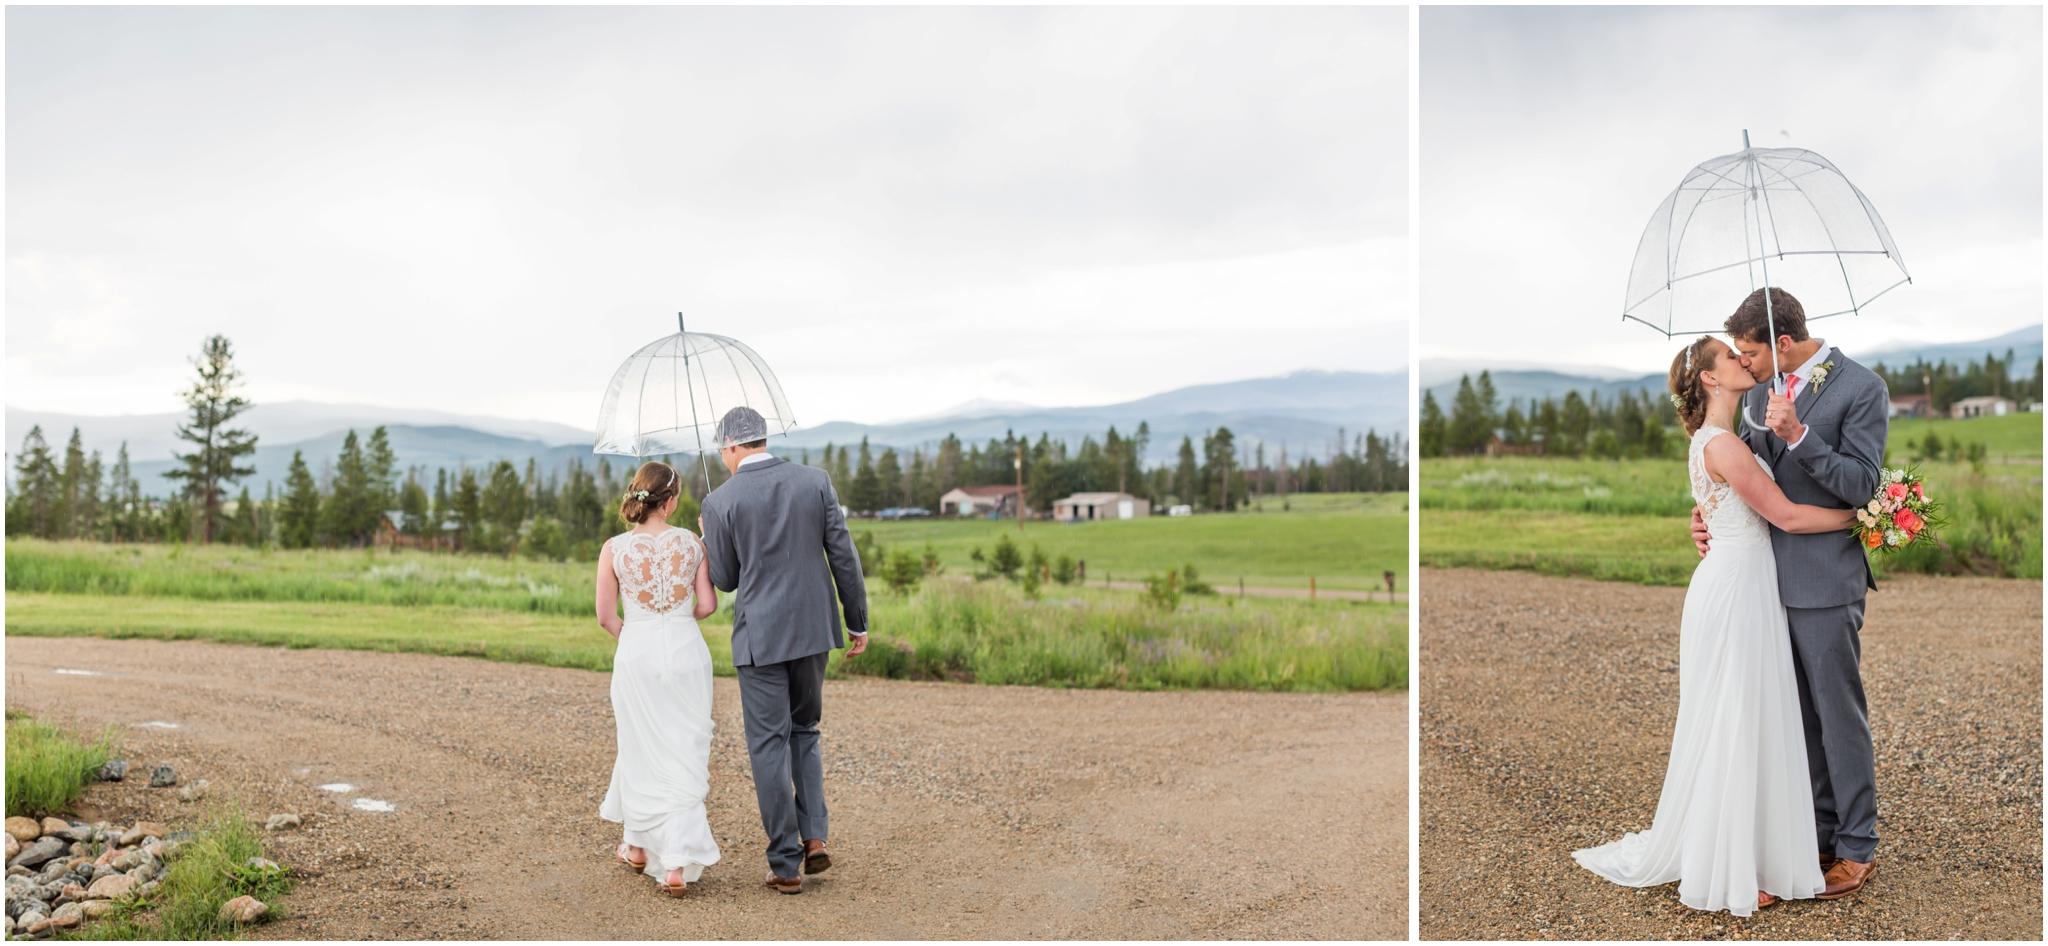 Strawberry_Creek_Ranch_Wedding_Photographer26.jpg